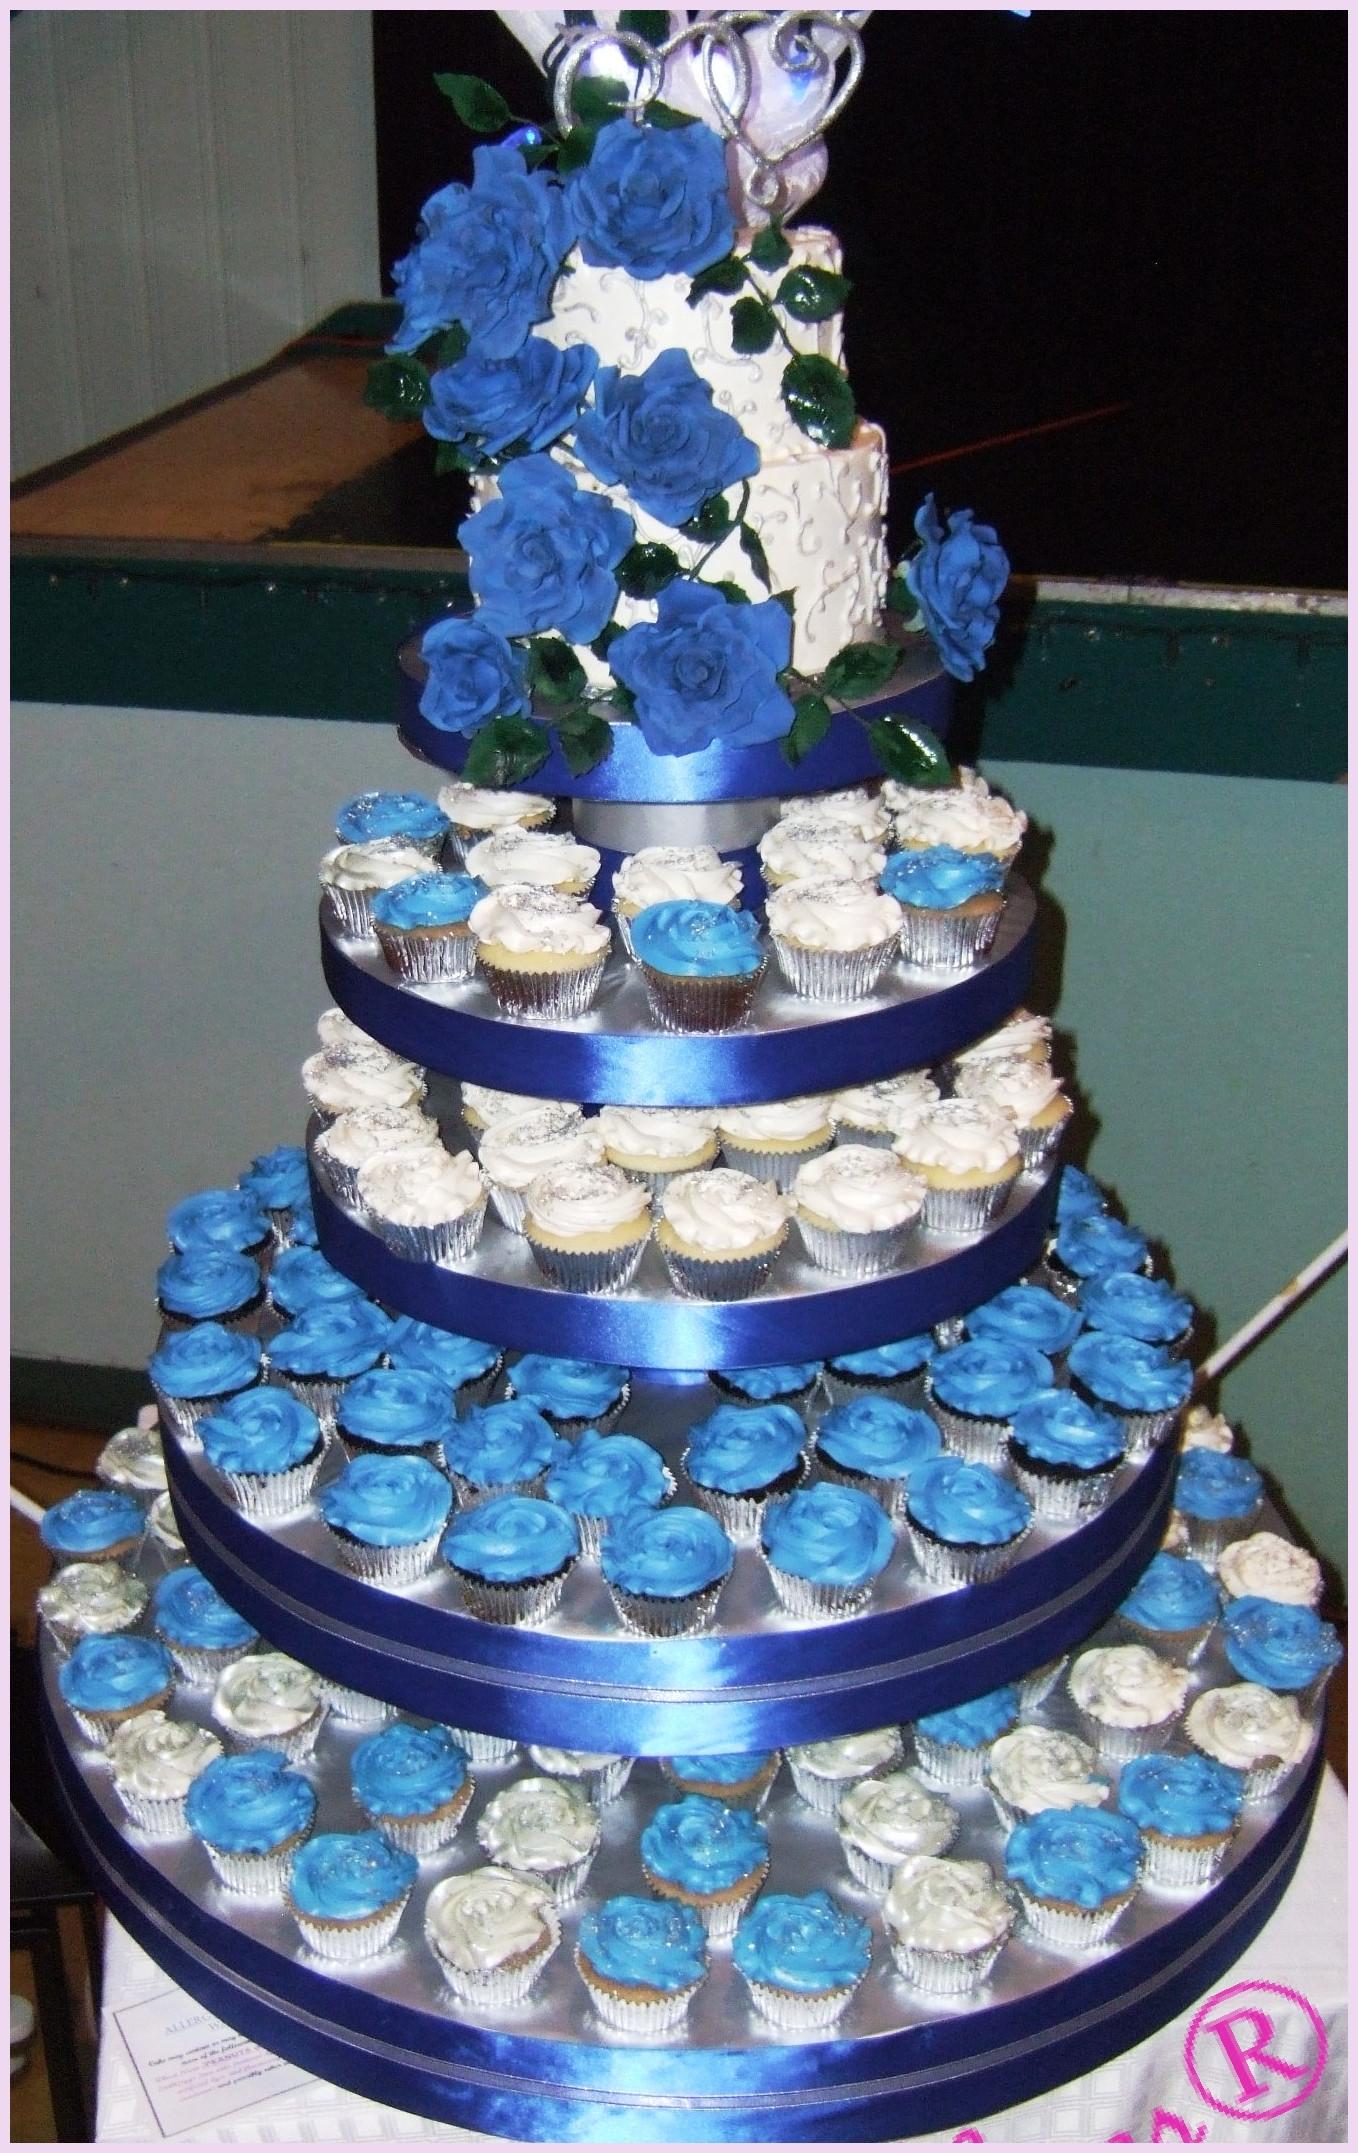 Wedding Cupcake Cakes Designs  Blue Wedding Cake Designs